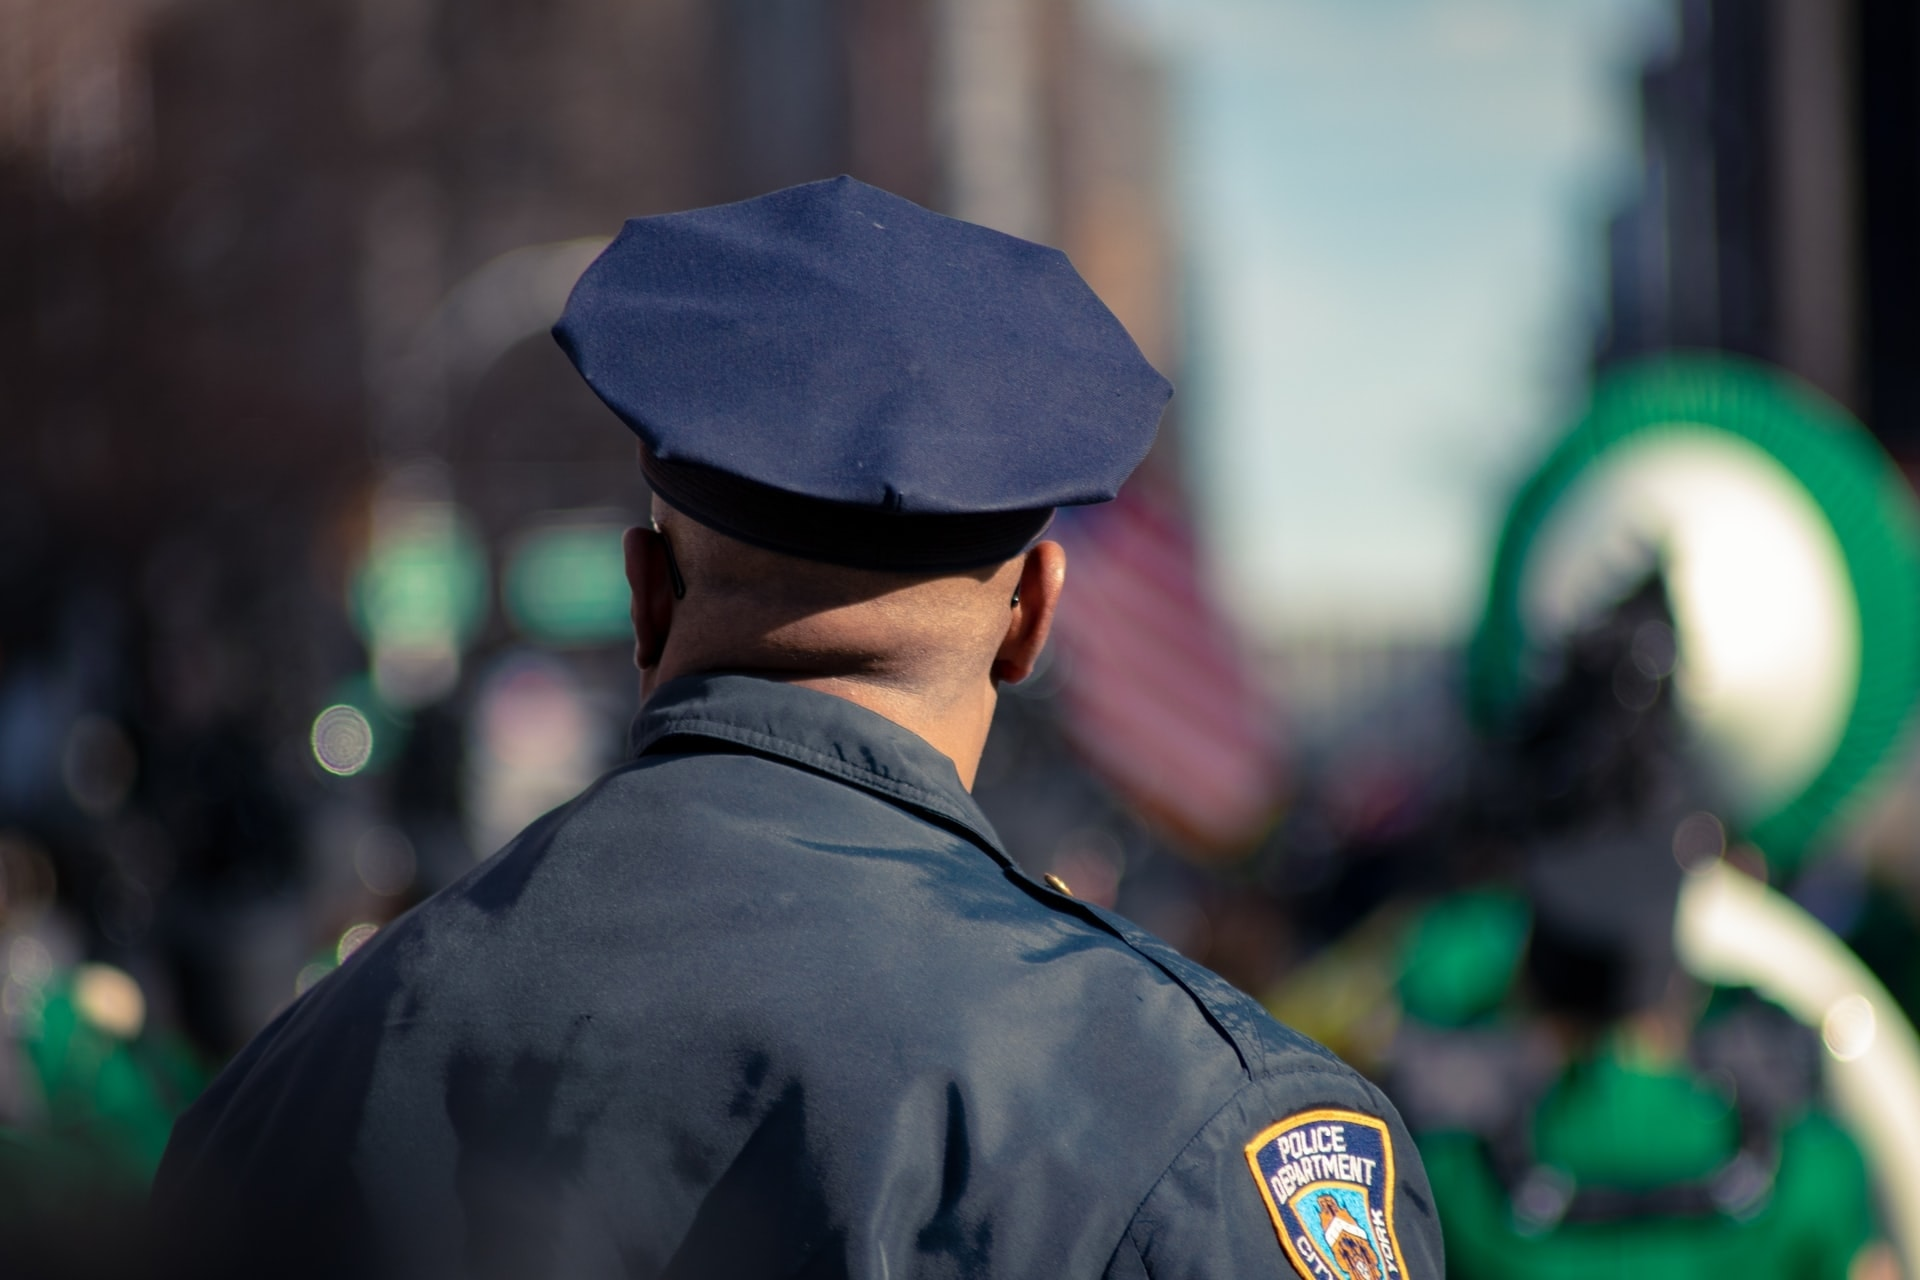 police man in uniform